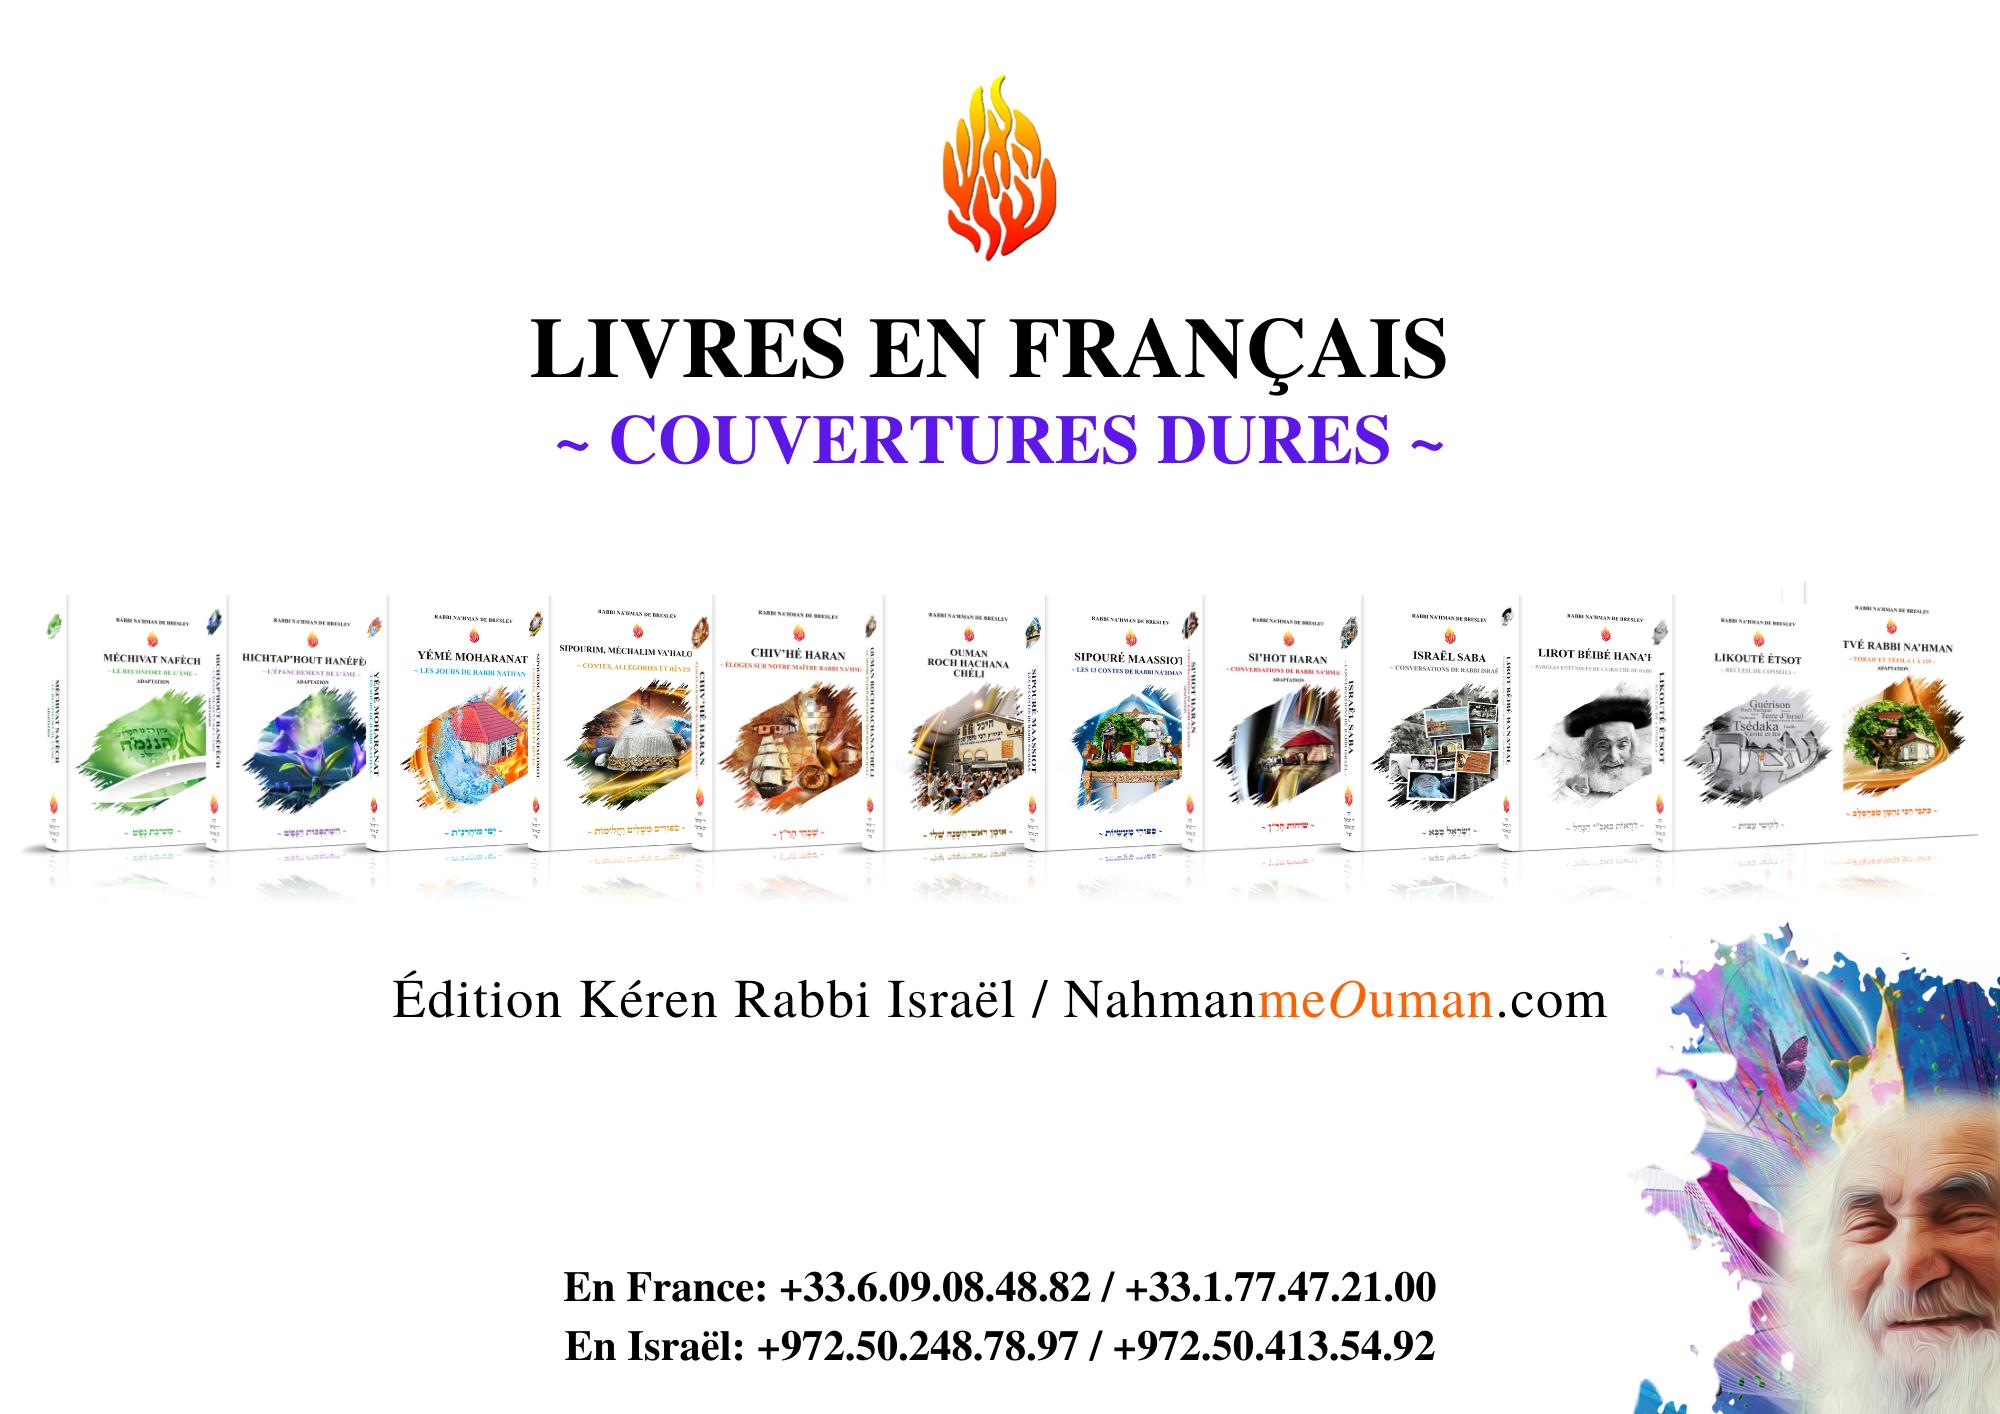 BOUTIQUE DES LIVRES DE RABBI NA'HMAN DE BRESLEV AU FORMAT DE POCHE & SIMILI-CUIR